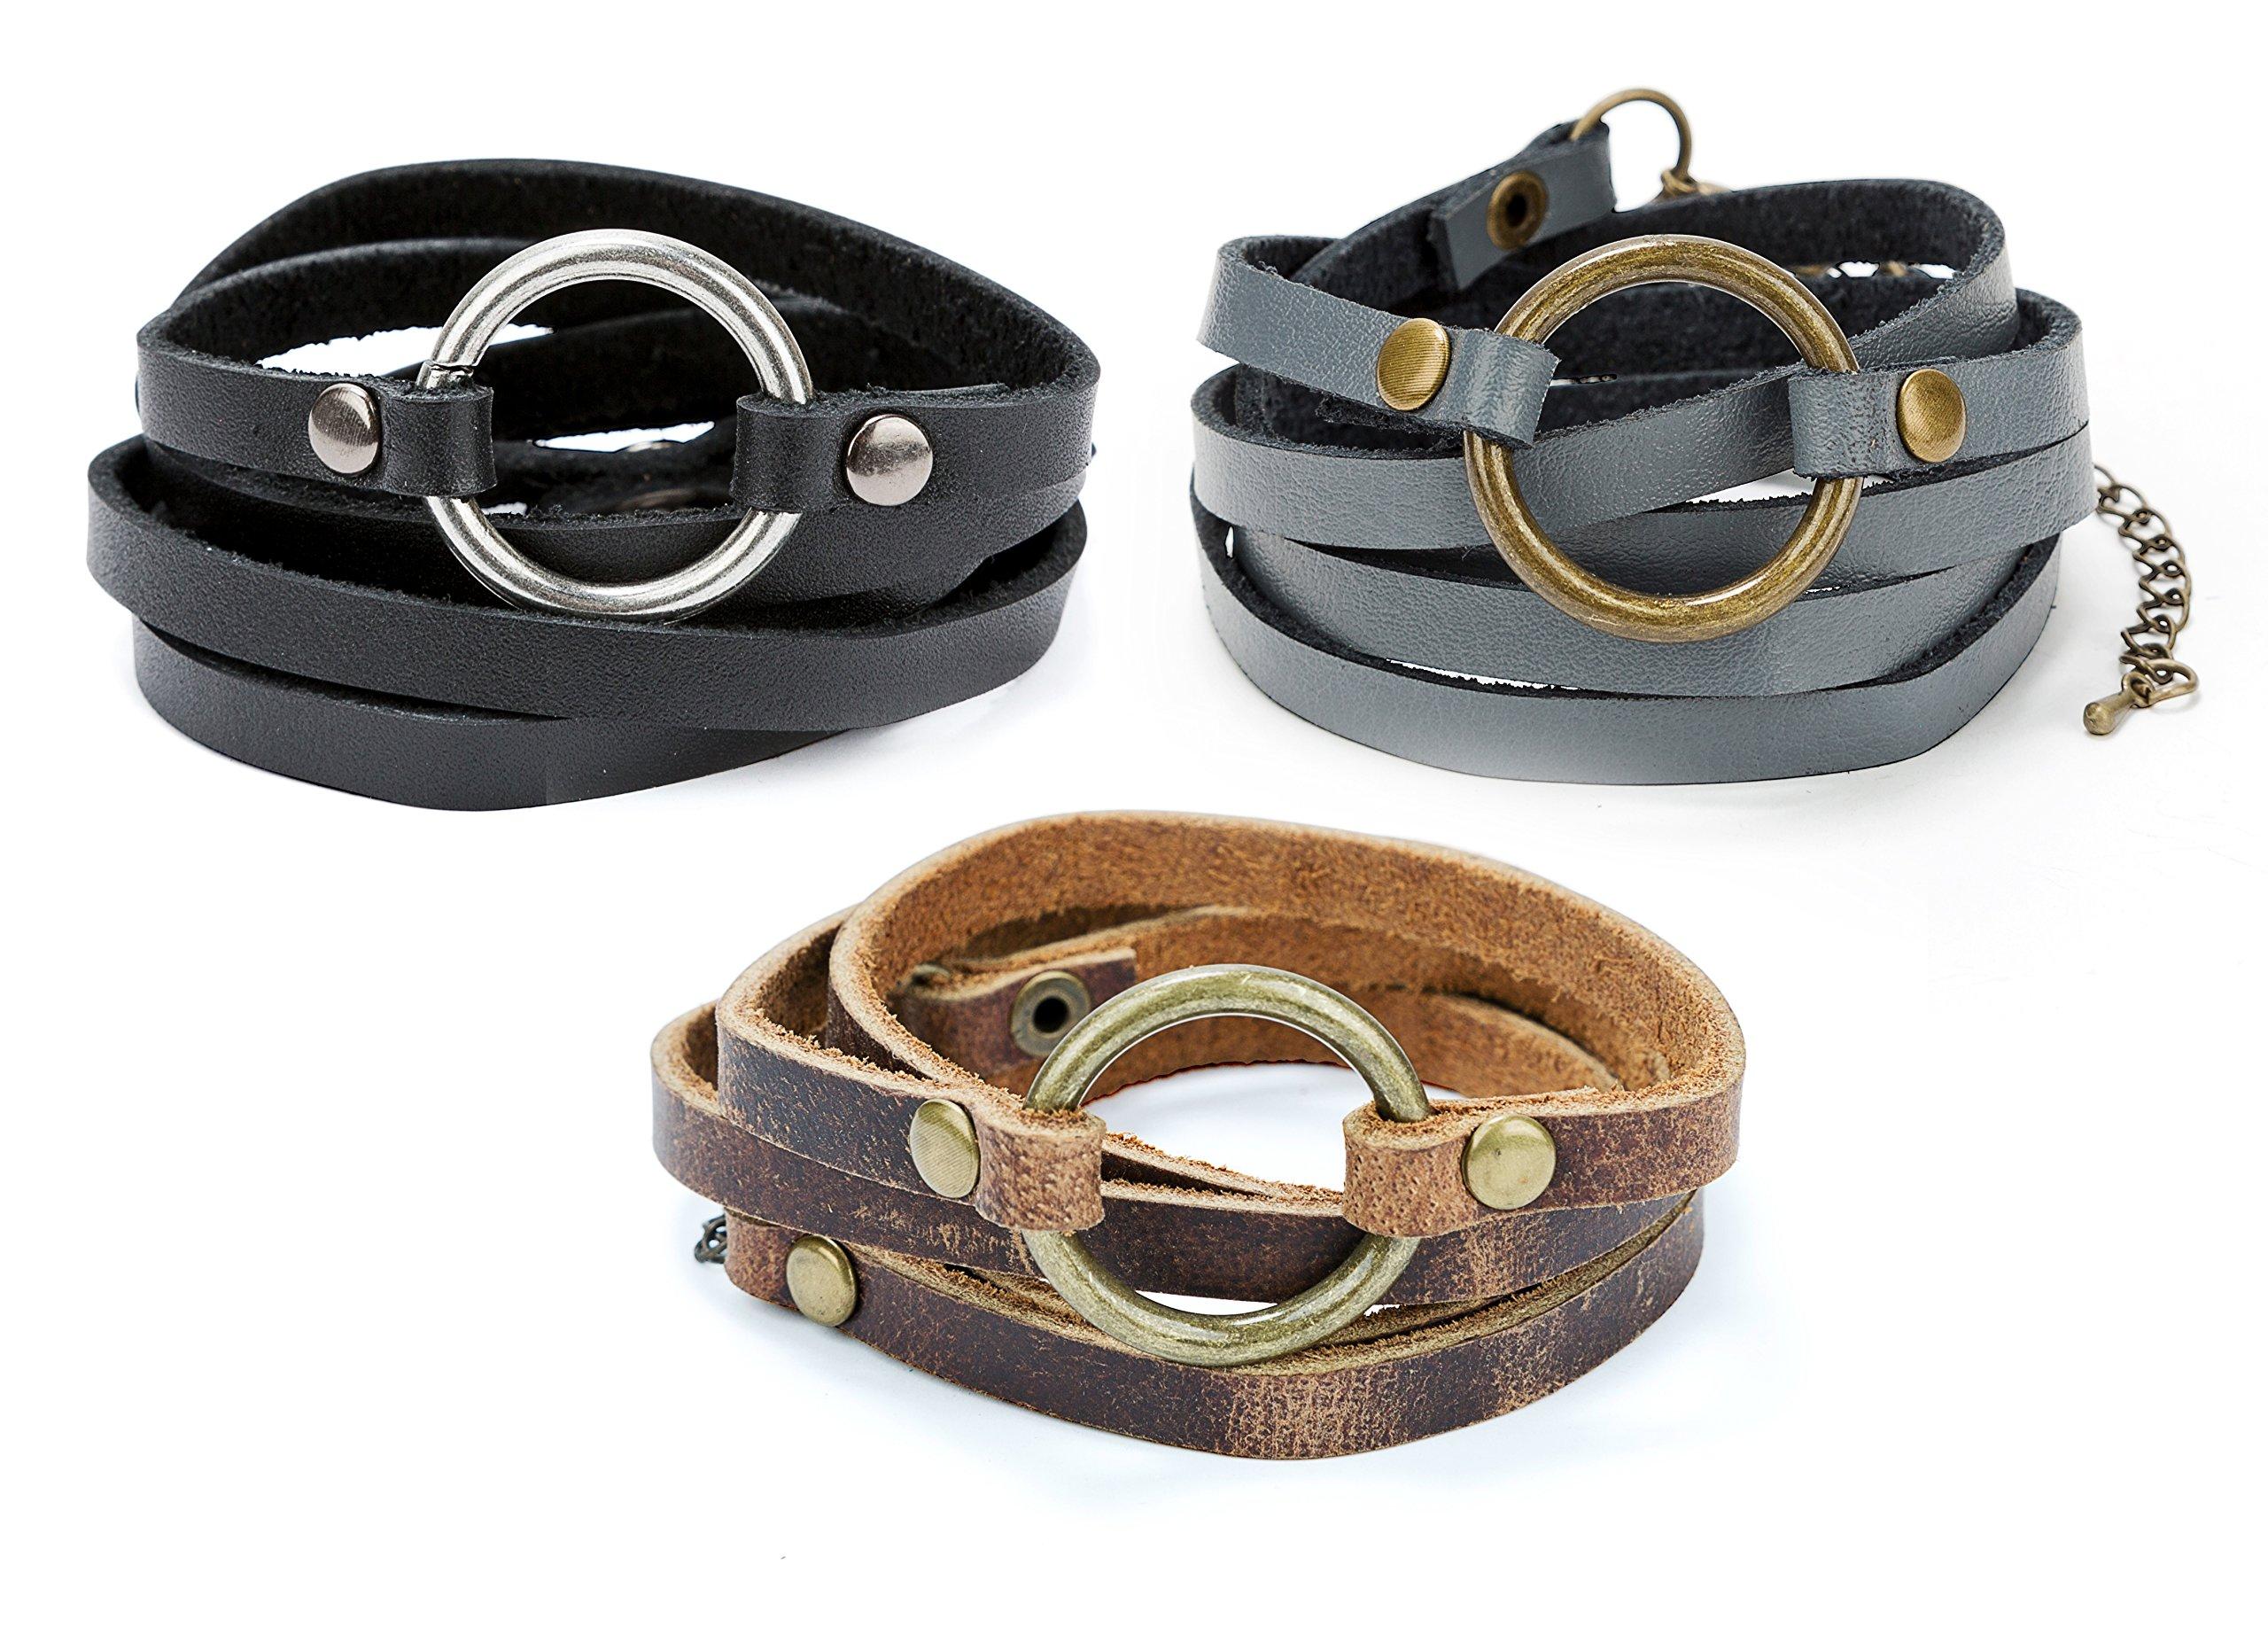 SPUNKYsoul 5 Wrap Leather Circle Bracelet Black, Brown & Grey for Women Collection (Set of 3)